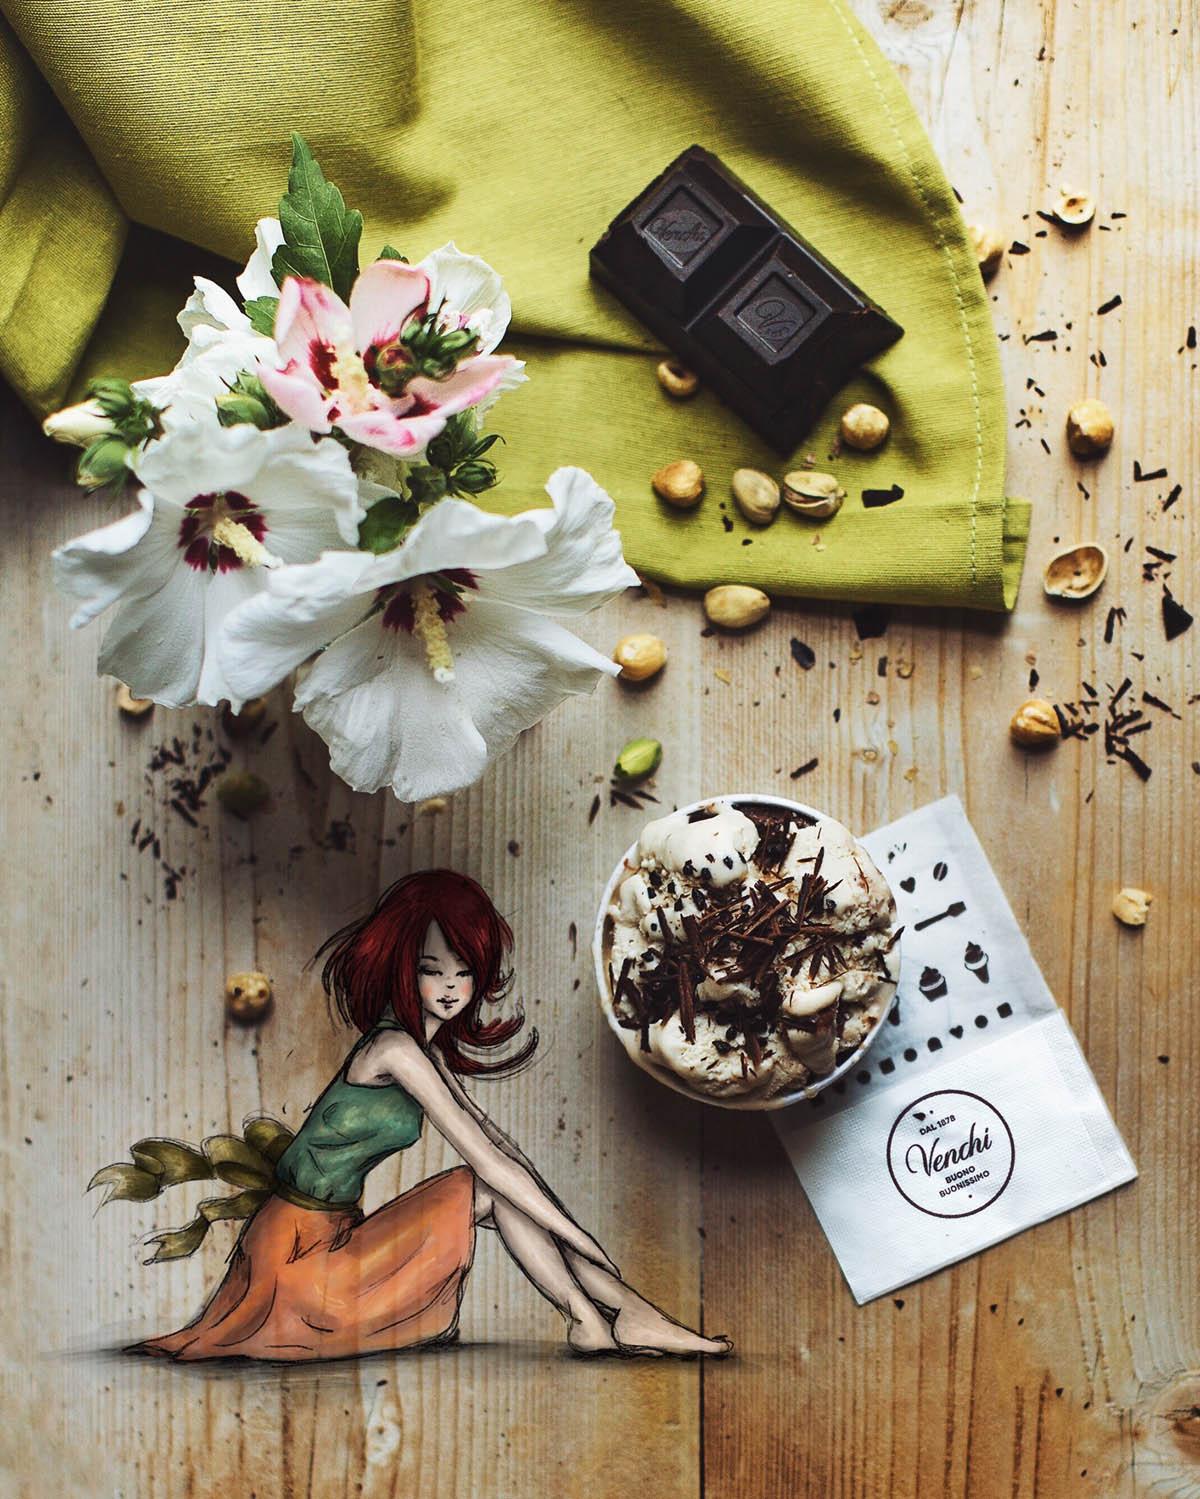 creative artwork idea venchi chocolate